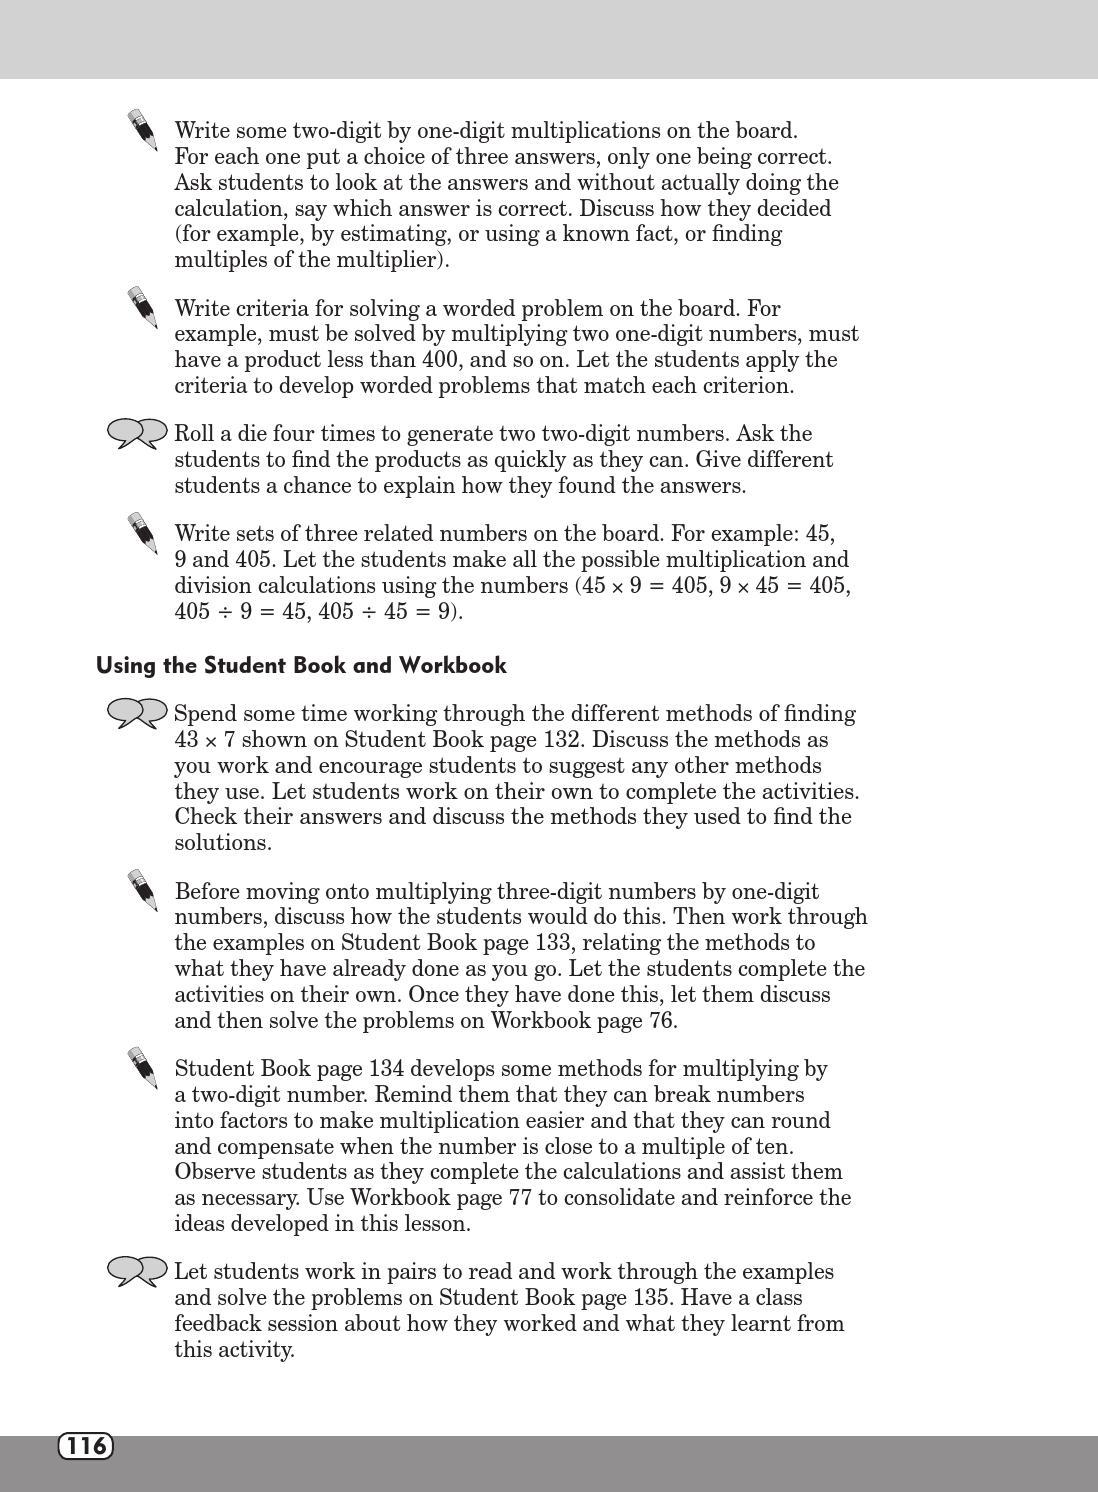 Workbooks workbook methods : Nelson international maths teacher guide 5 by hany mufeid - issuu